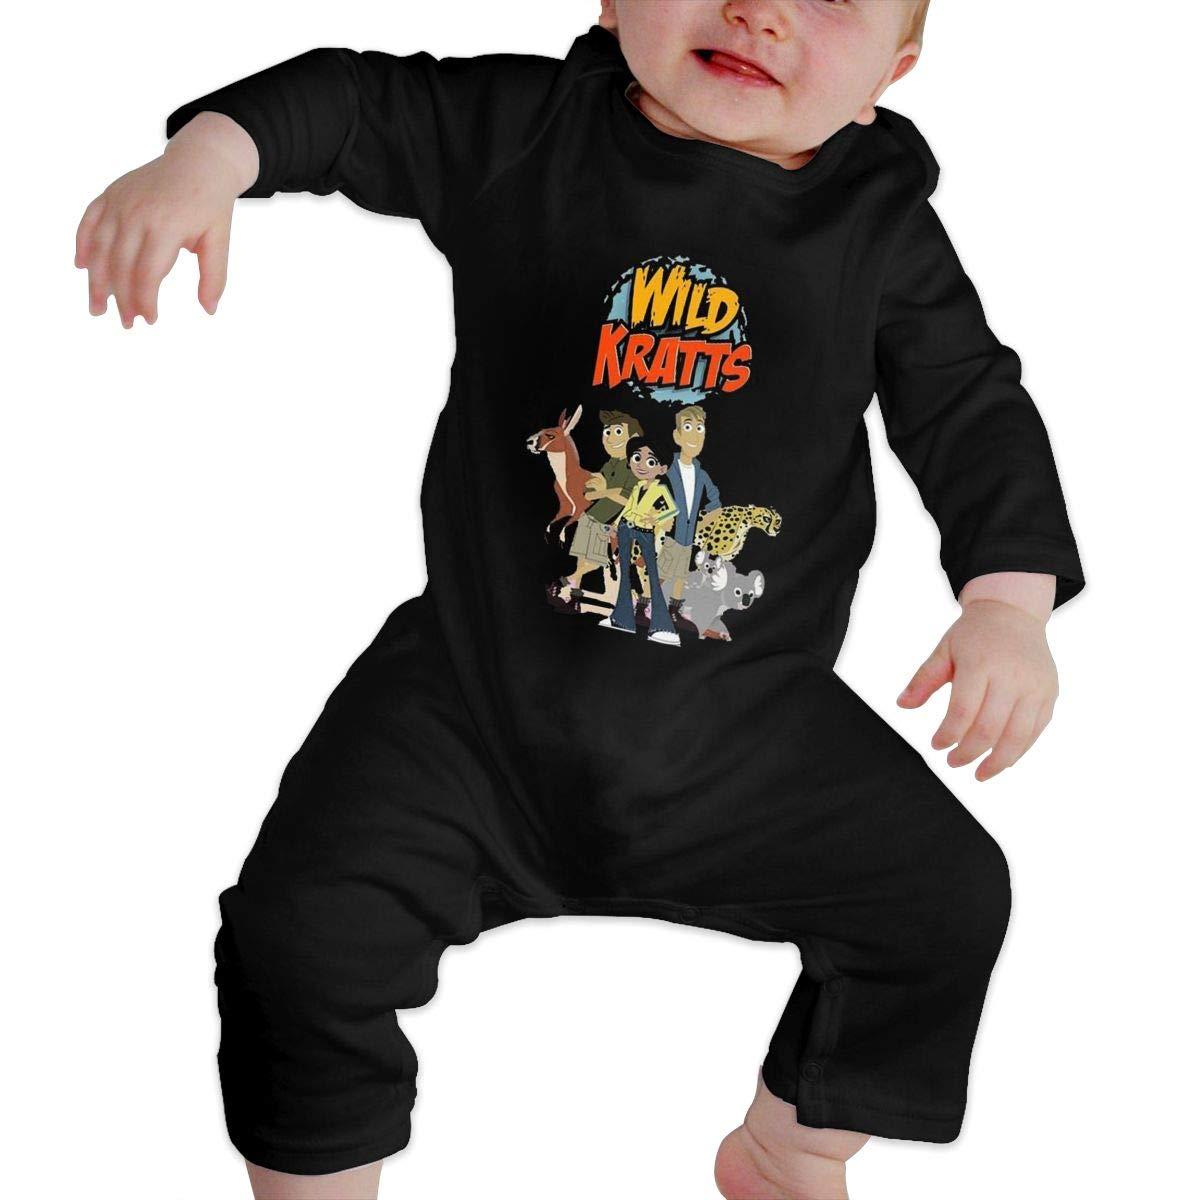 Fional Infant Long Sleeve Romper Wild Kratts Newborn Babys 0-24M Organic Cotton Jumpsuit Outfit